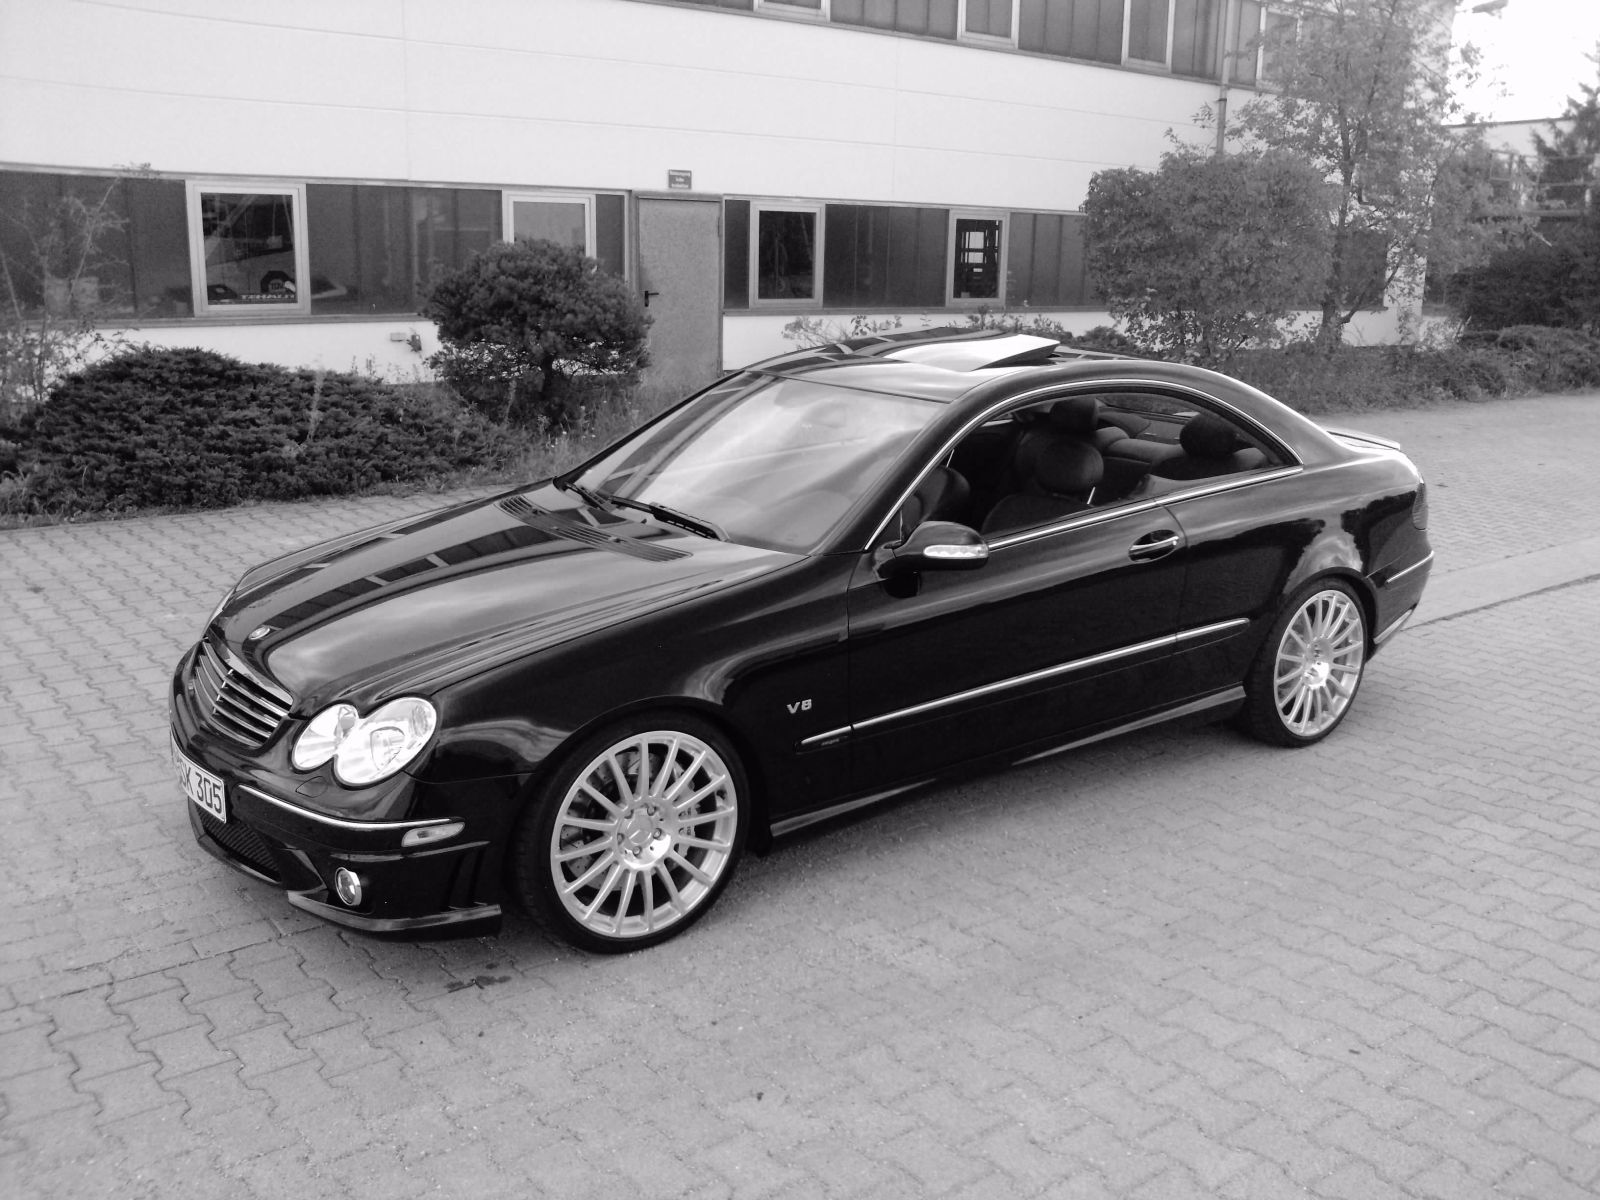 (VENDO): CLK500 Avantgarde 2004/2004 - R$85.000,00 (VENDIDA) Xdhu75